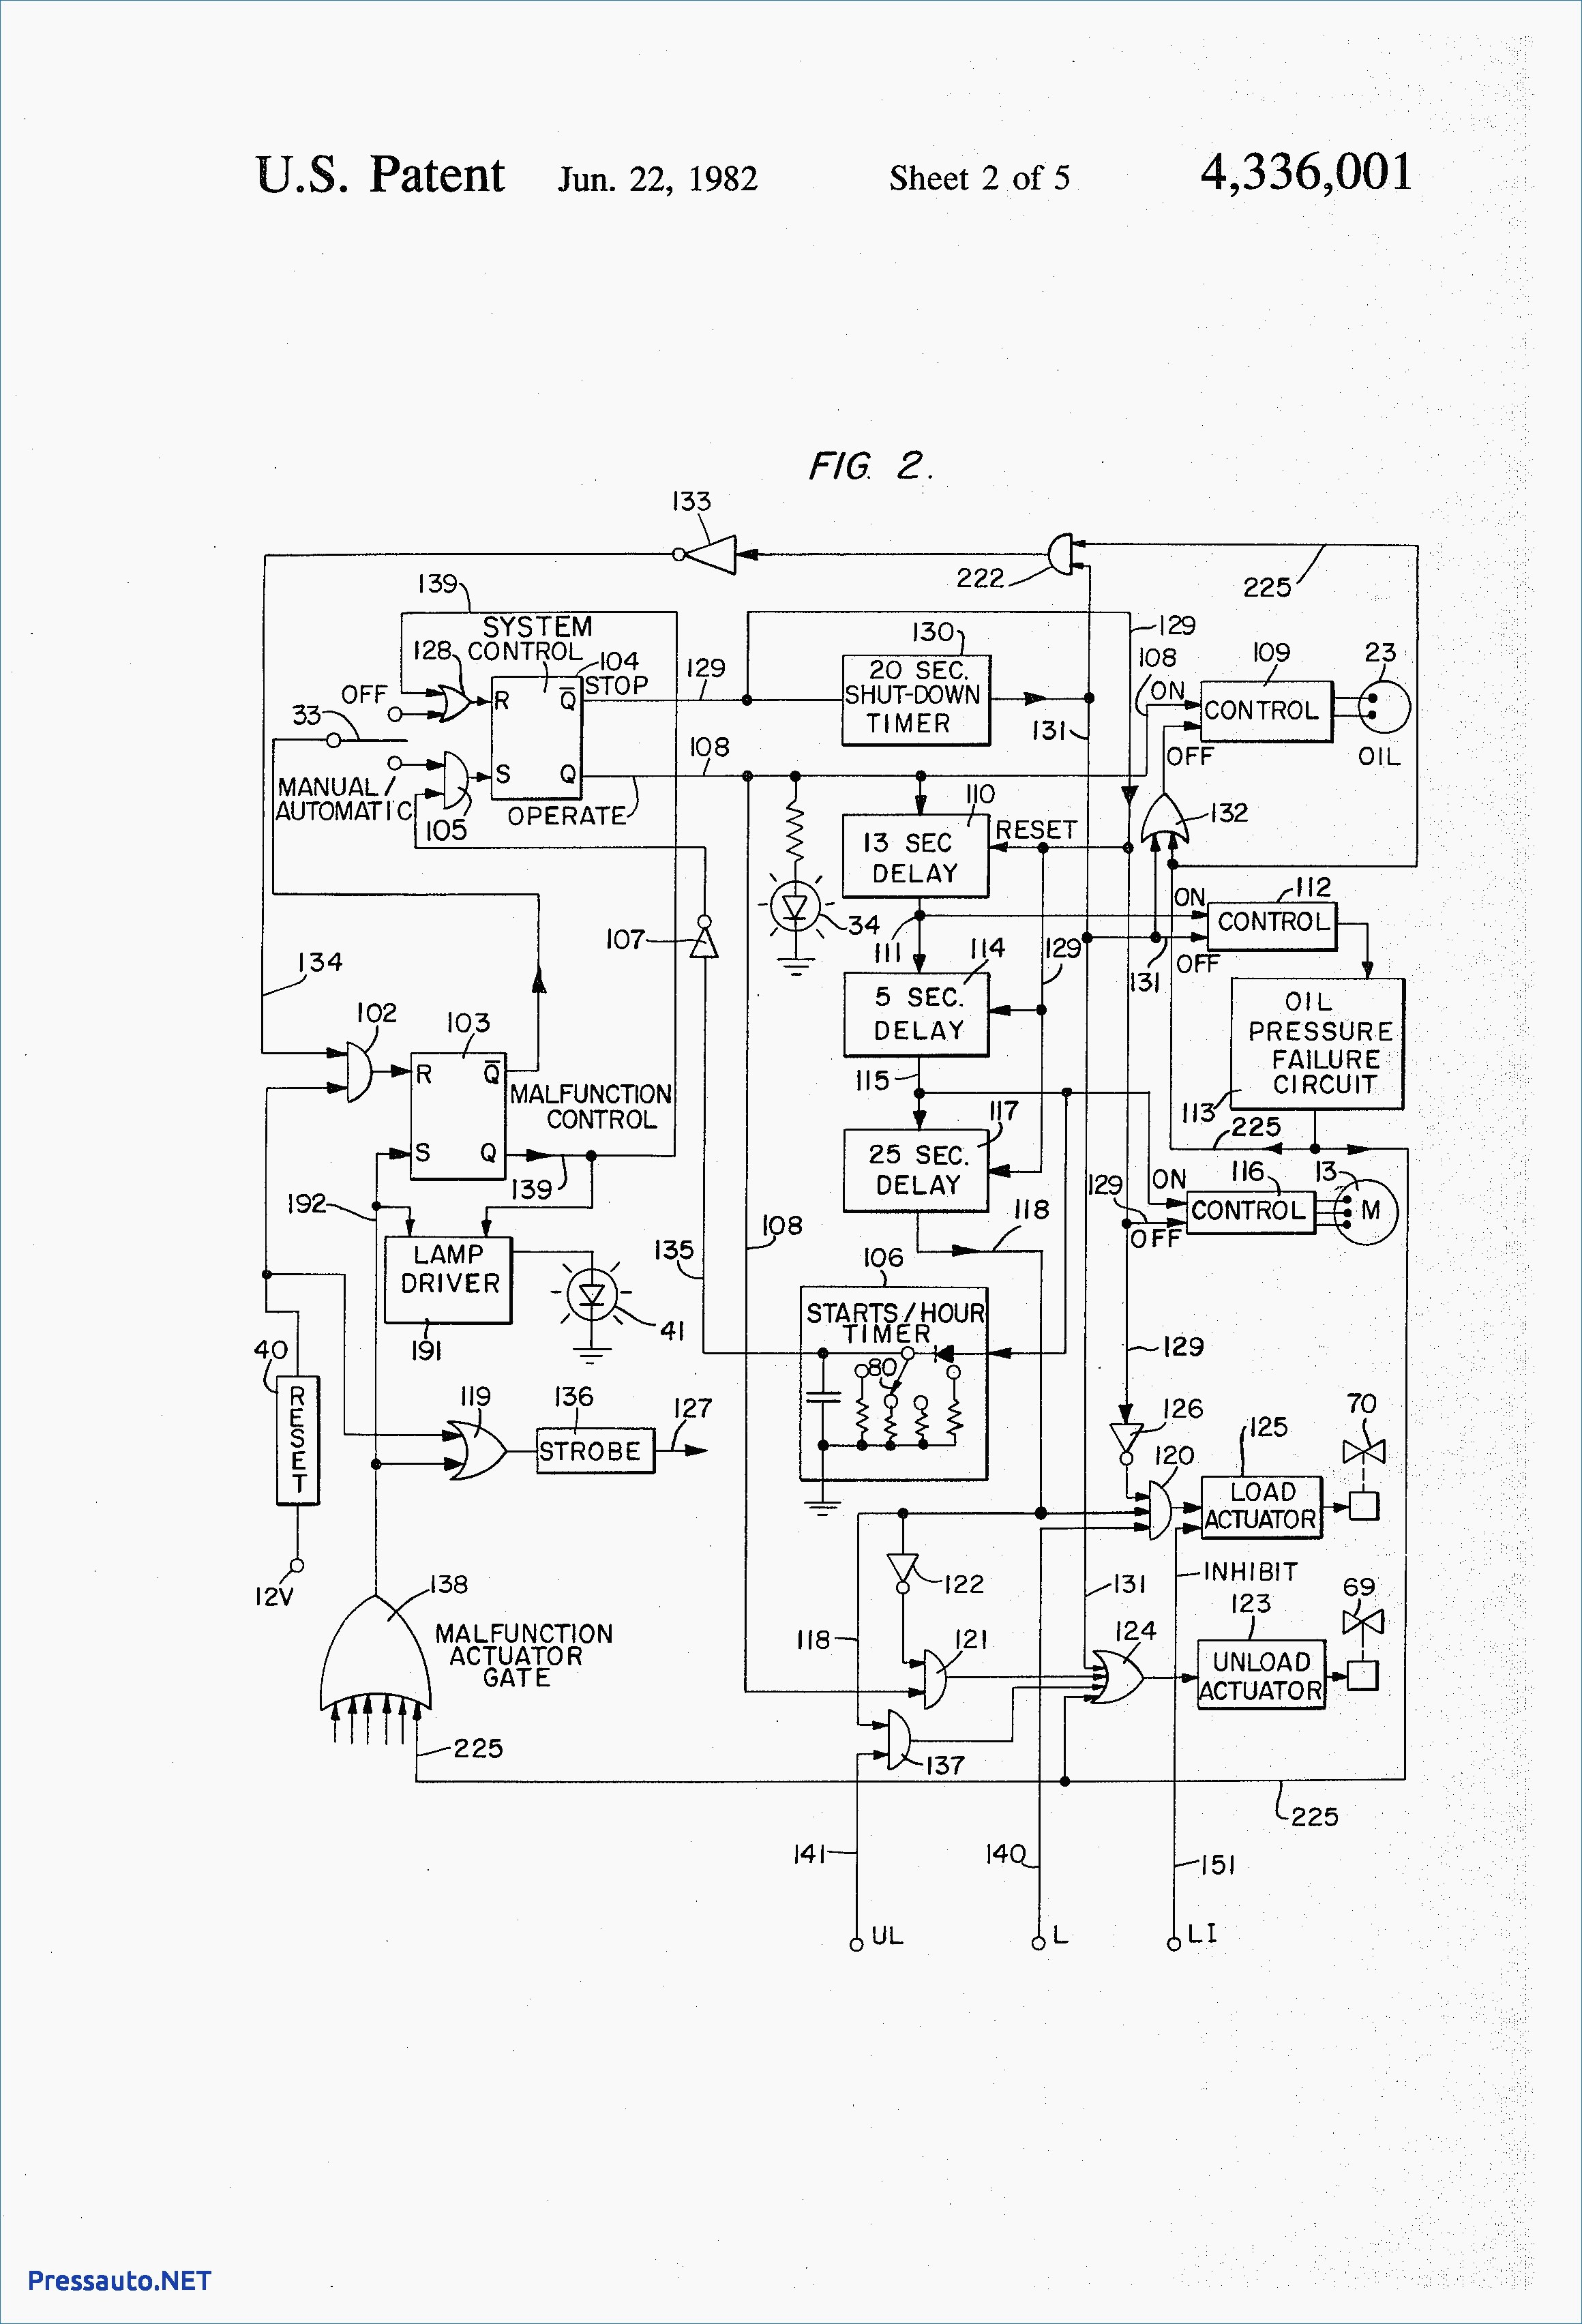 ingersoll rand t30 wiring diagram Download-Ingersoll Rand Air pressor Wiring Diagram Lovely Charming K Z Durango Wiring Diagram Contemporary Electrical 10-j